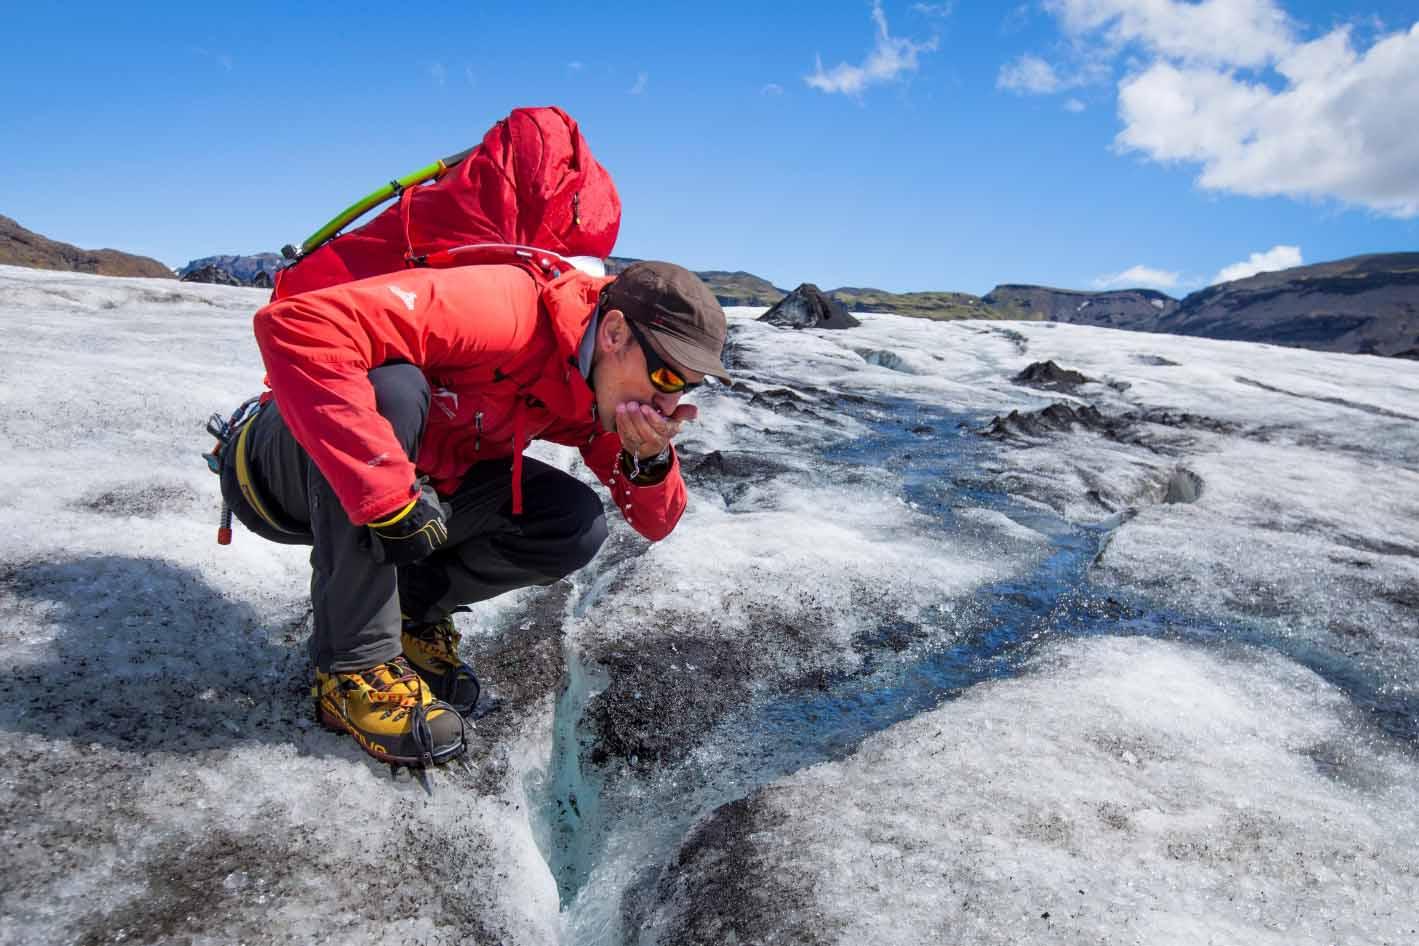 Abundance of ice cold water